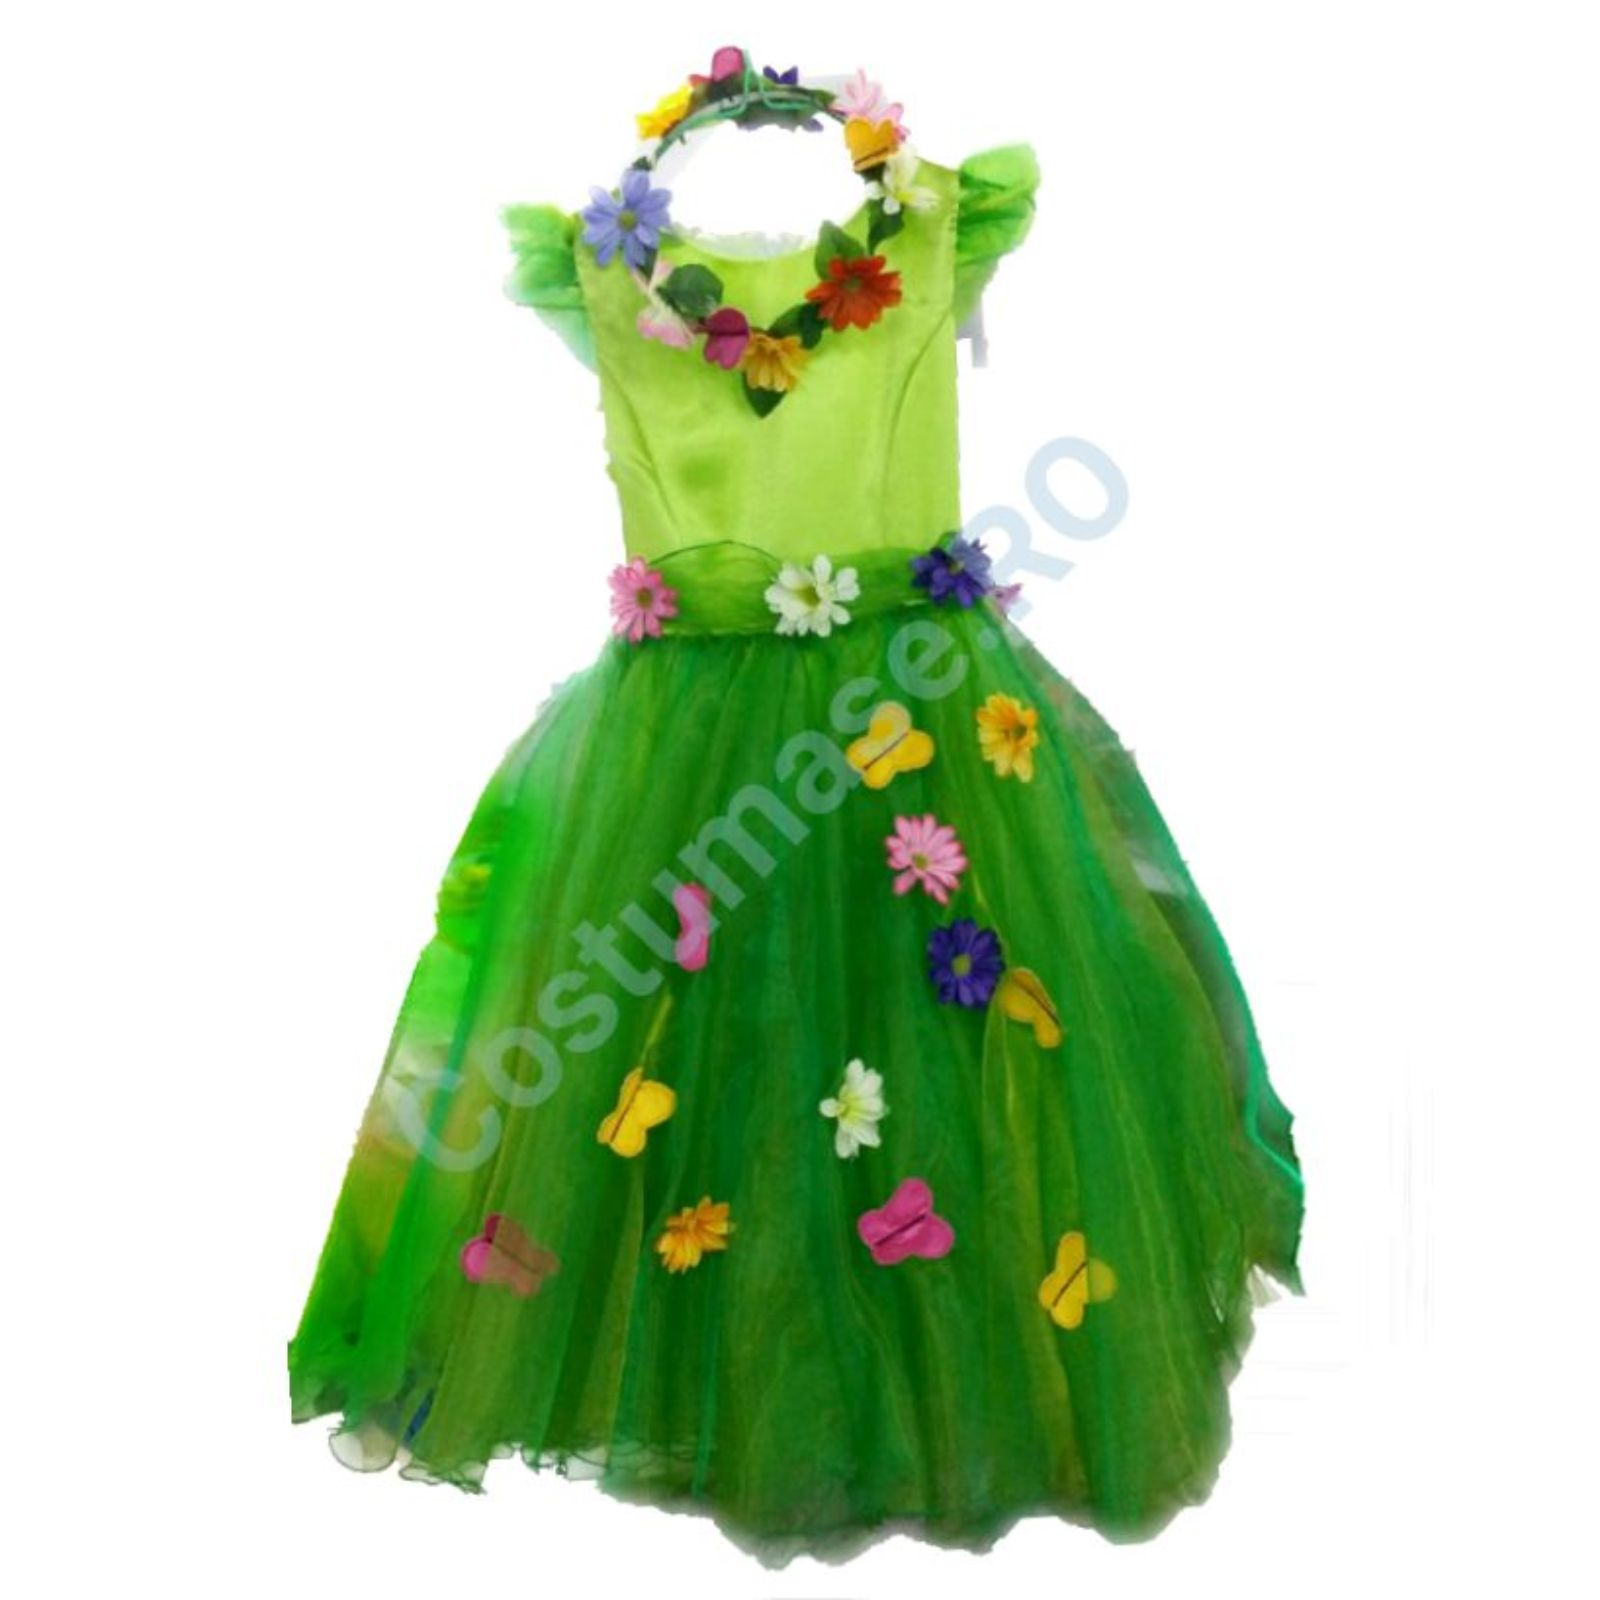 Zana Primavara verde cu flori si fluturasi